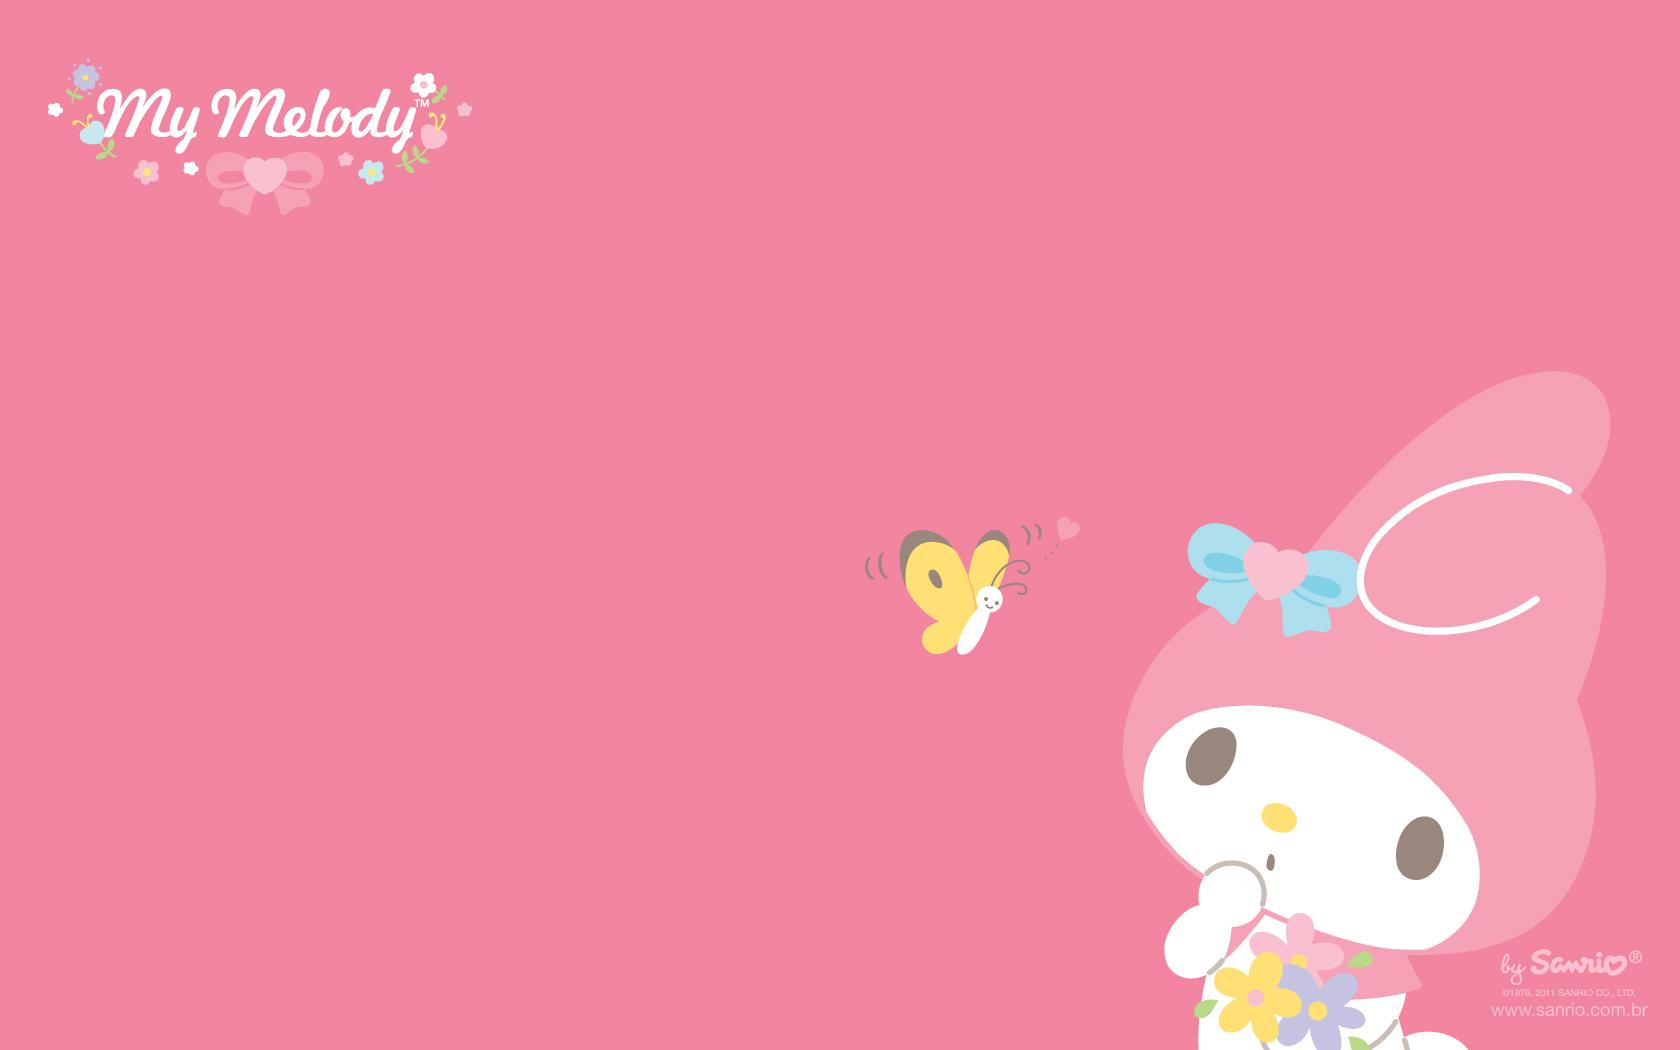 My melody wallpaper wallpapersafari - Casa hello kitty ...